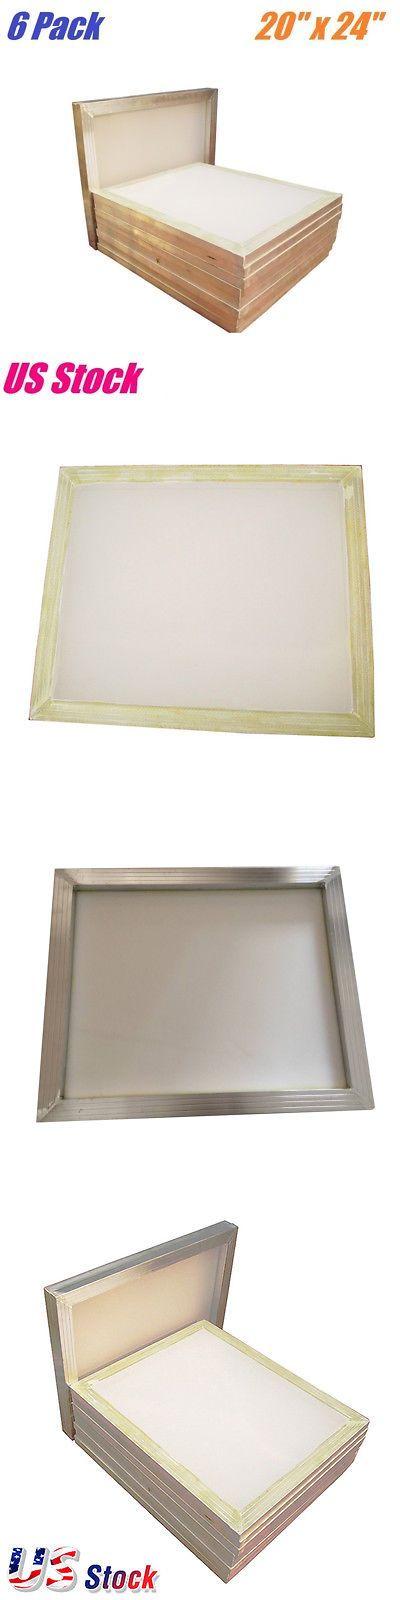 Screen Printing Frames 183114 6 Pcs 20 X 24 Aluminum Frame Silk Screen Printing Screens 160 Mesh C Screen Printing Frame Screen Printing Silk Screen Printing